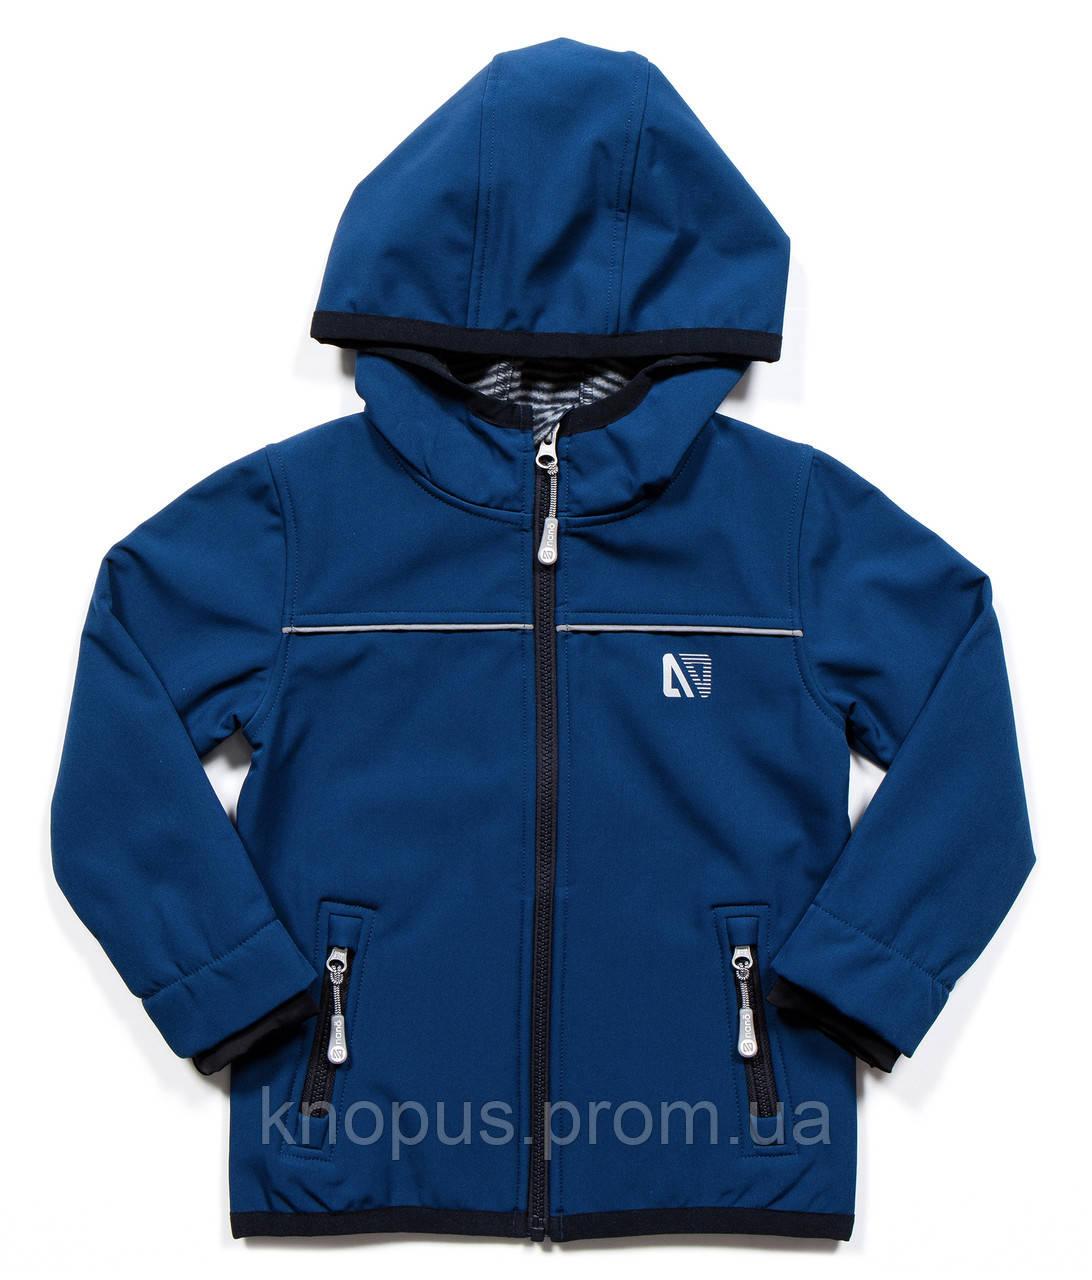 Демисезонная куртка SOFTSHELL   1400 M S18,  Dk Denim, Nano